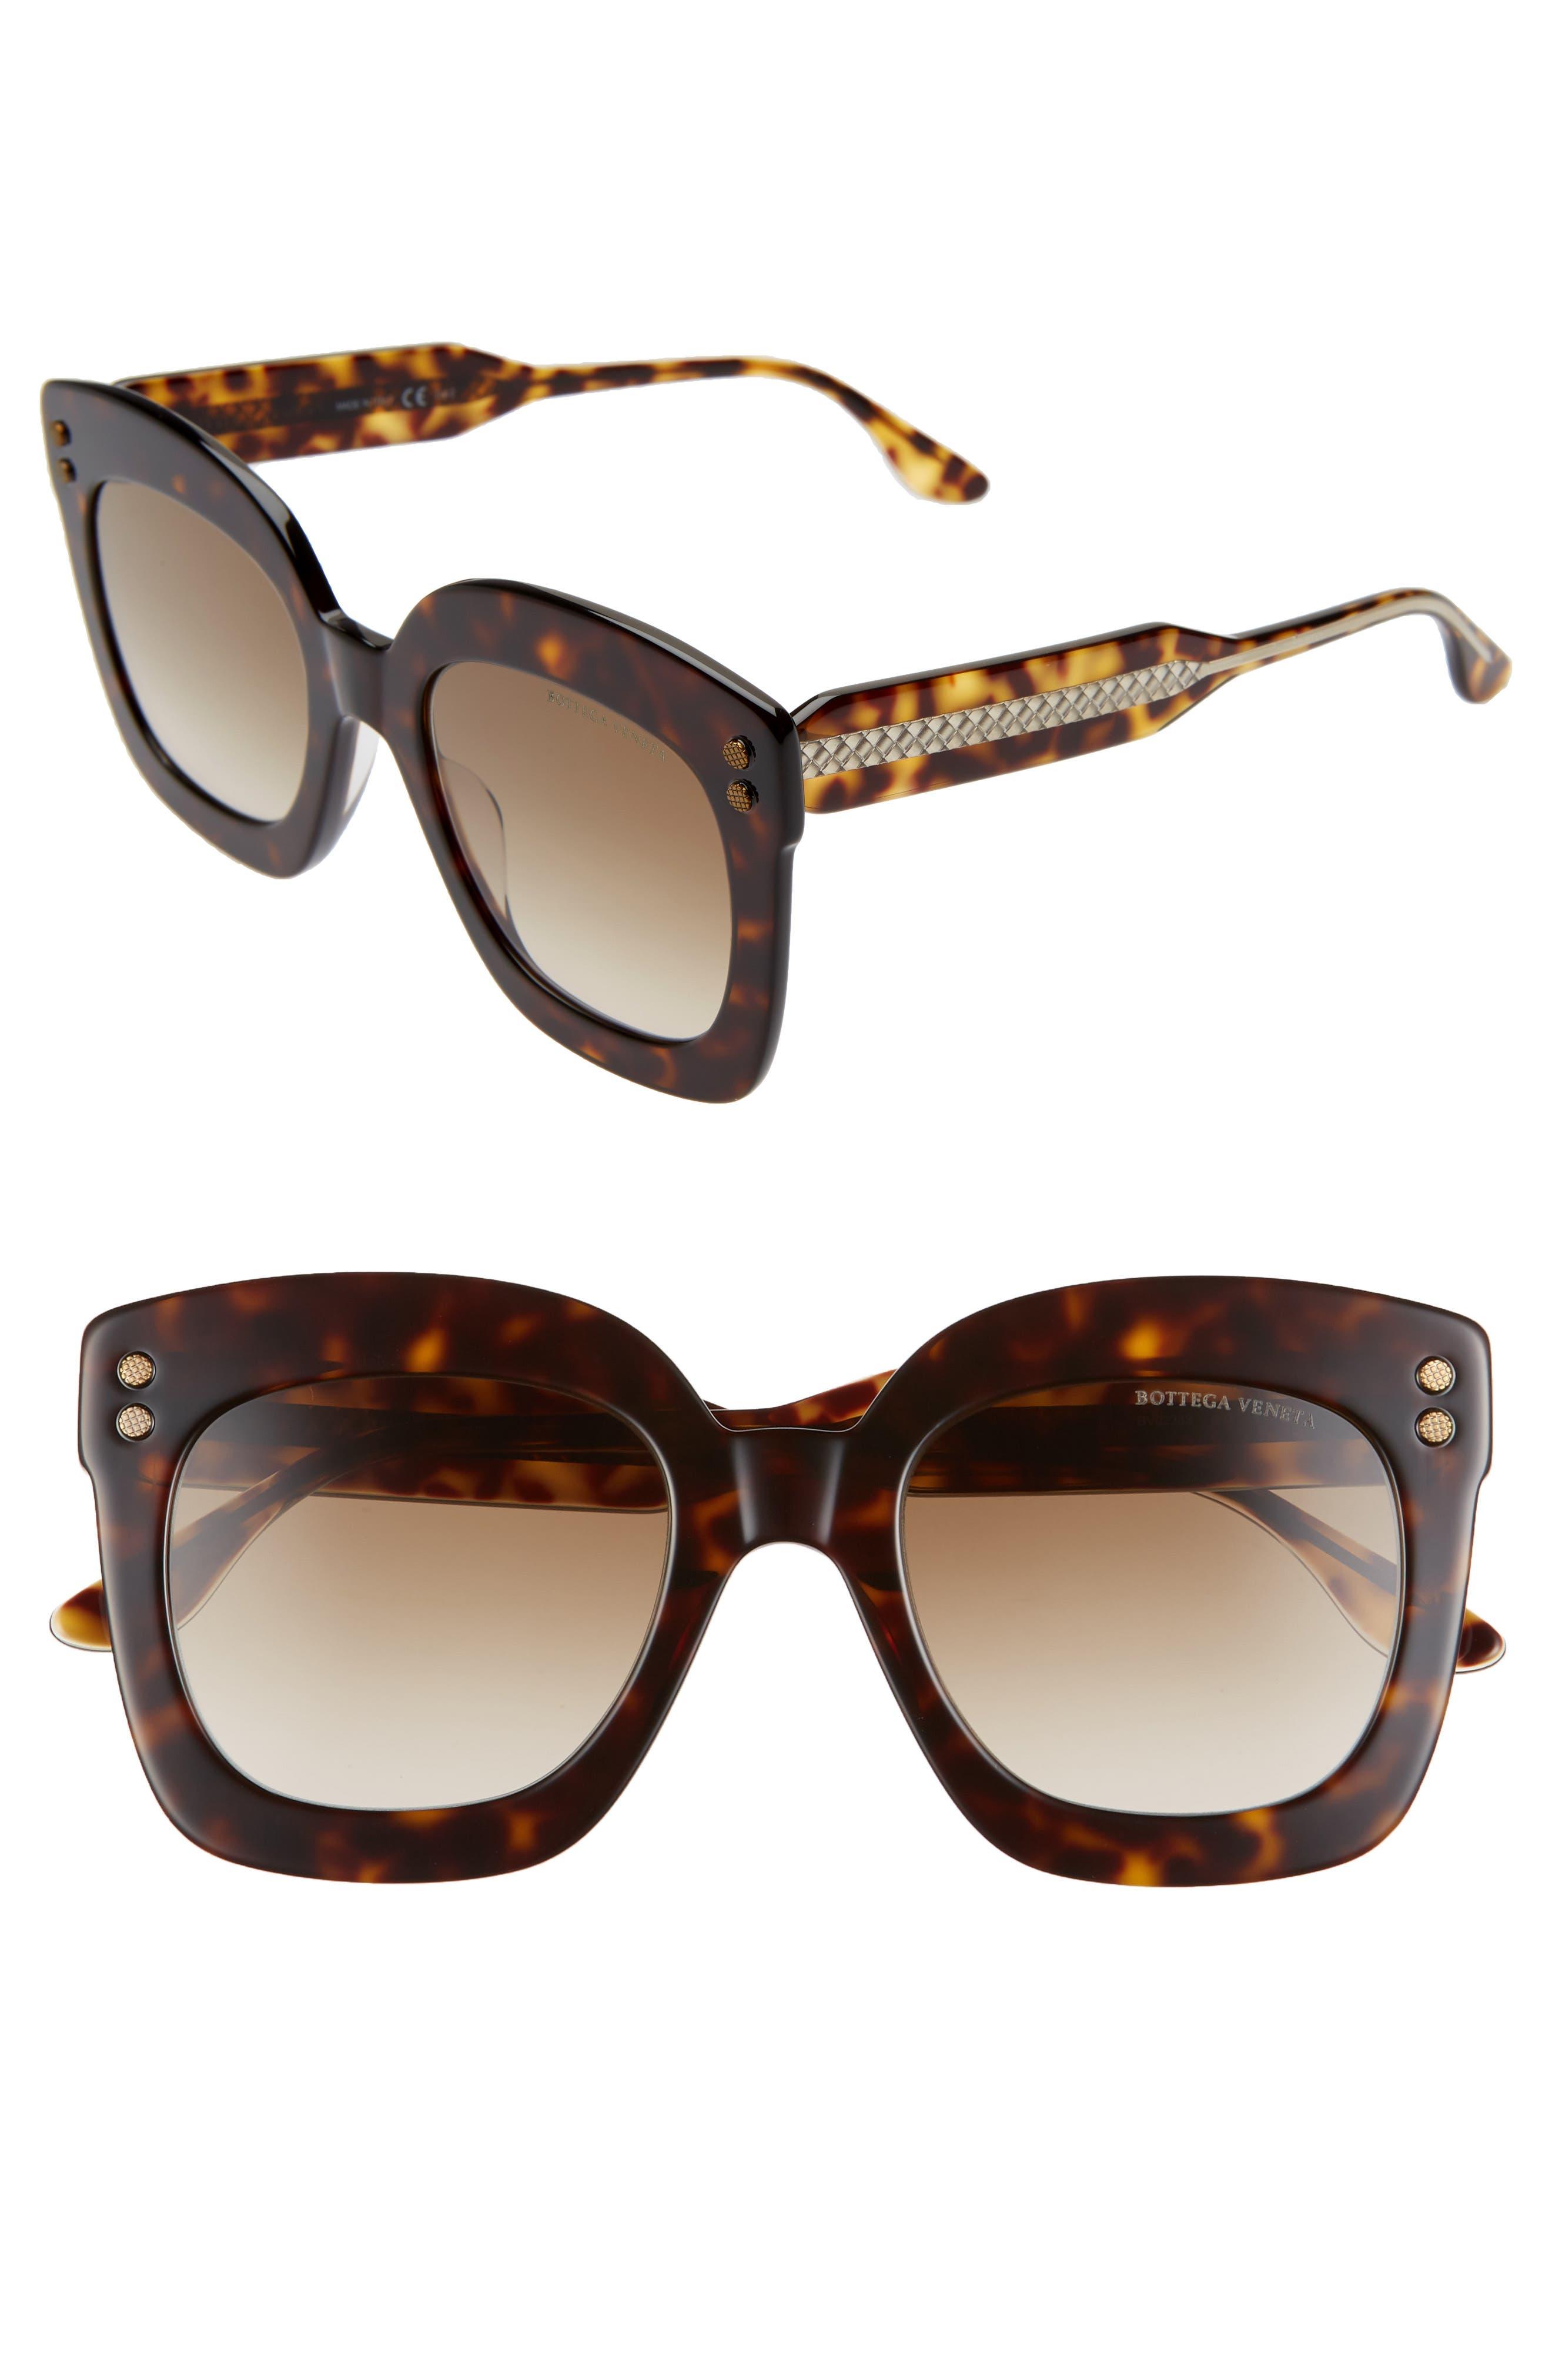 Bottega Veneta 51Mm Gradient Square Sunglasses - Dark Havana/ Brown